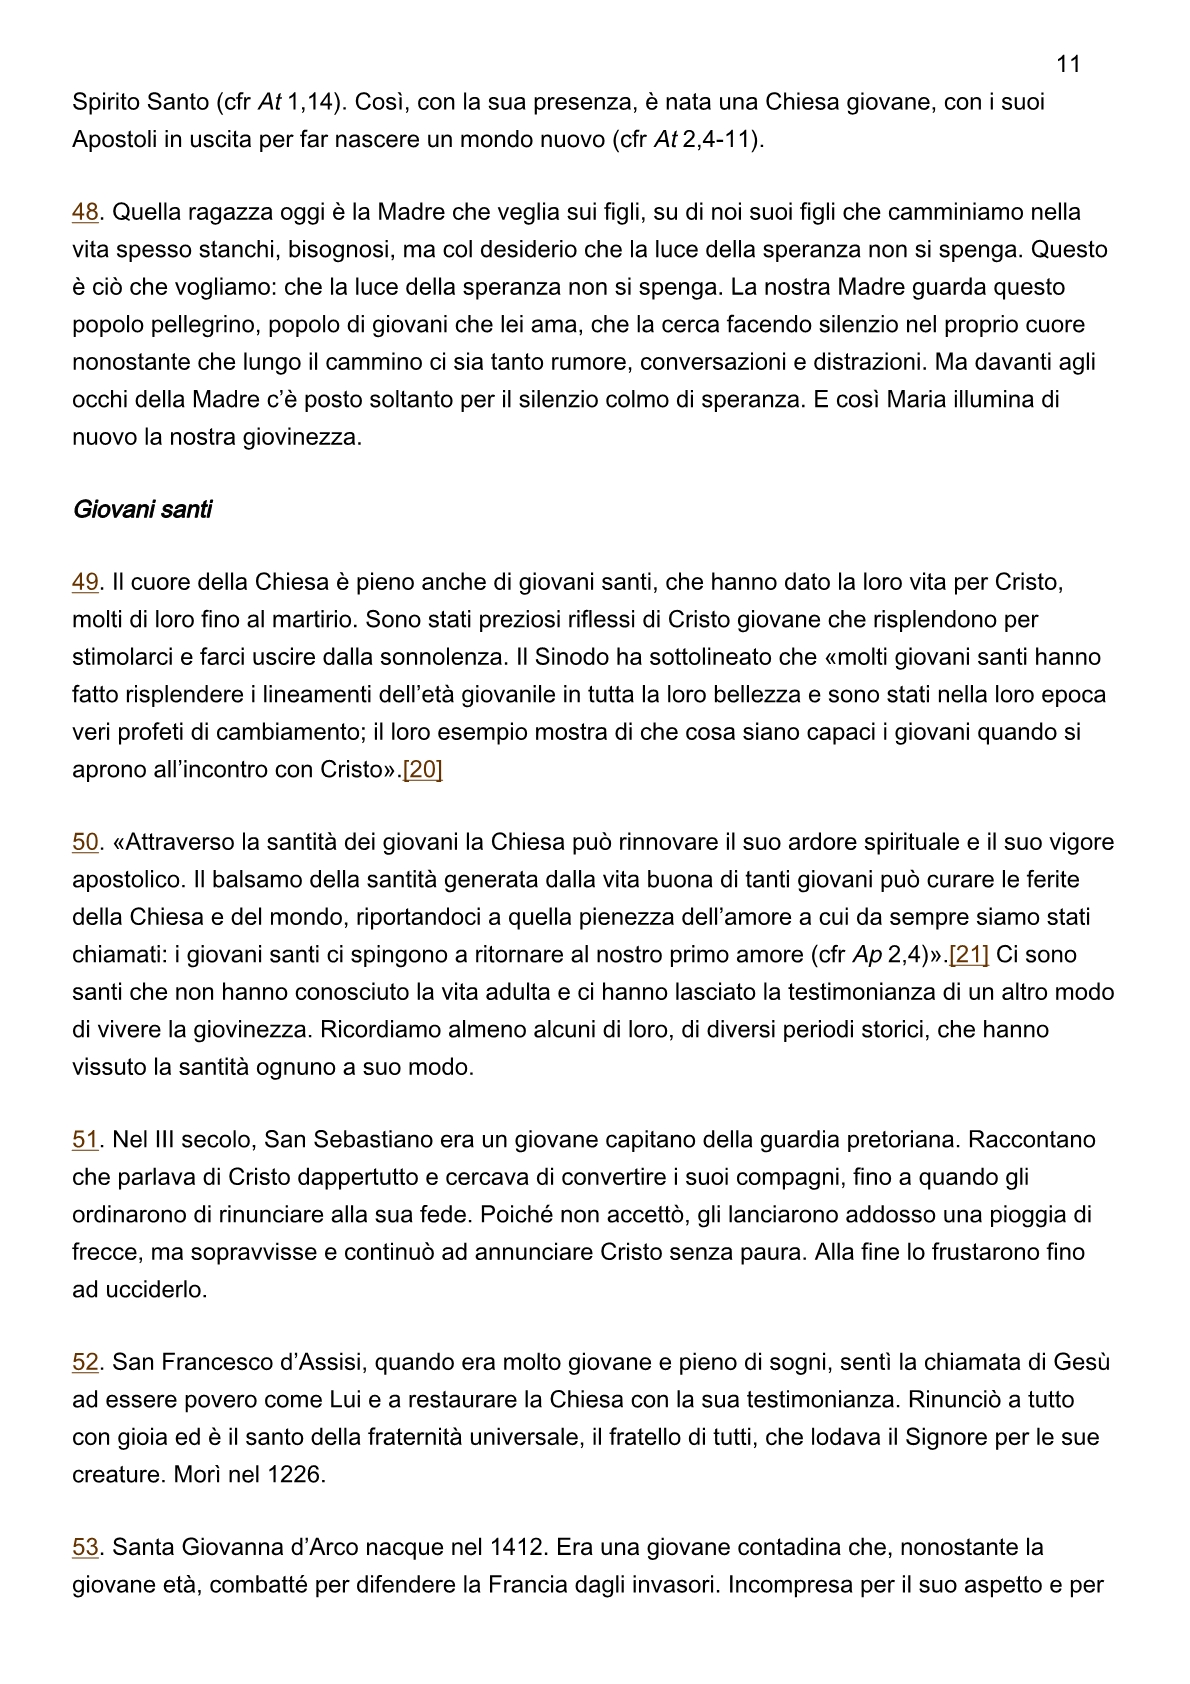 papa-francesco_esortazione-ap_20190325_christus-vivit11